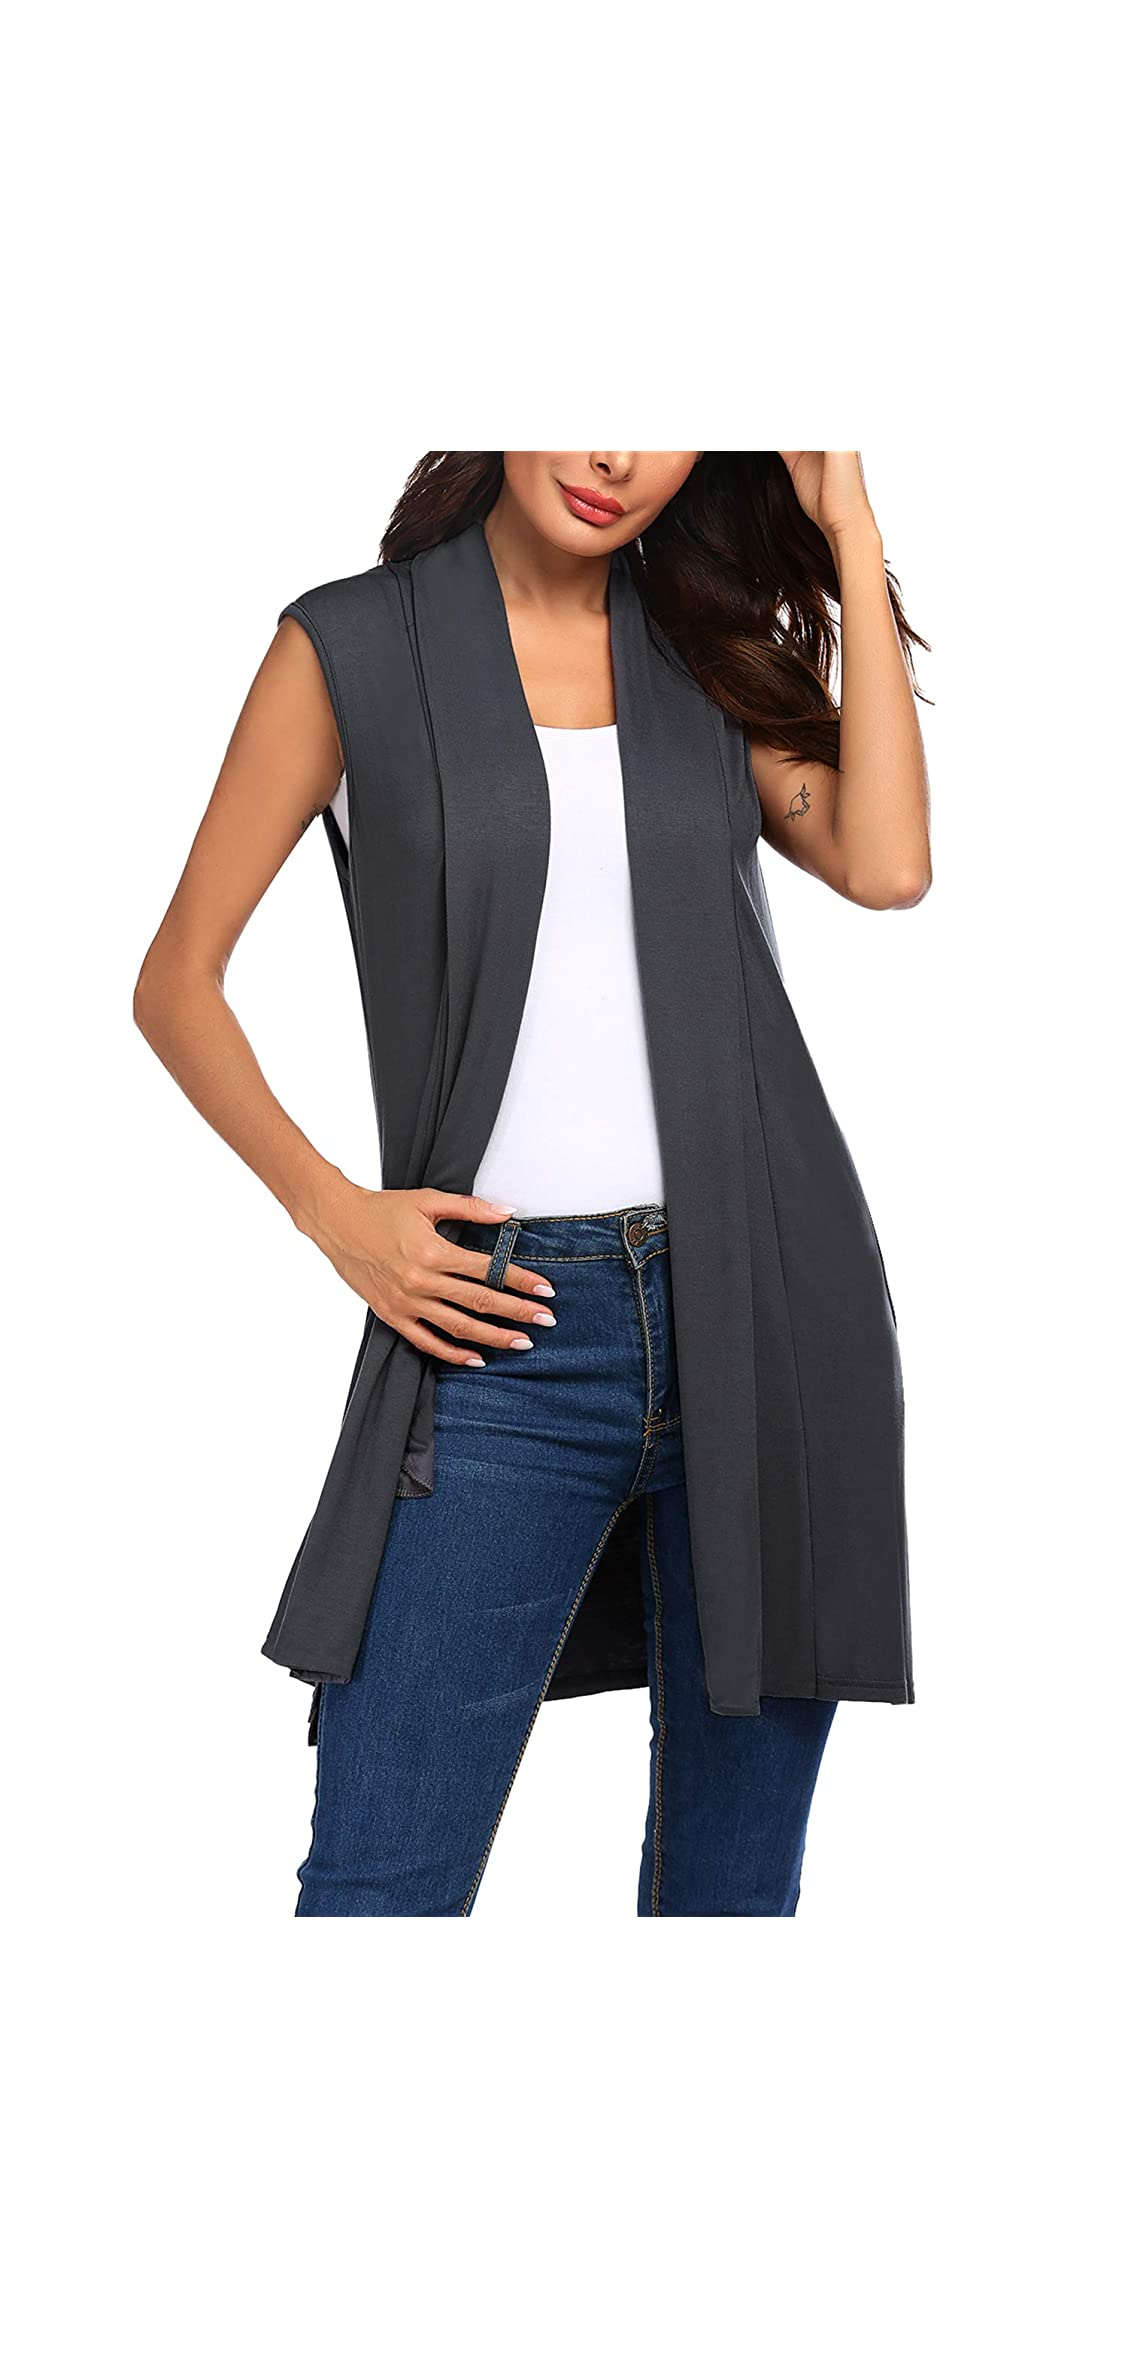 Womens Long Vests Sleeveless Draped Lightweight Open Vest